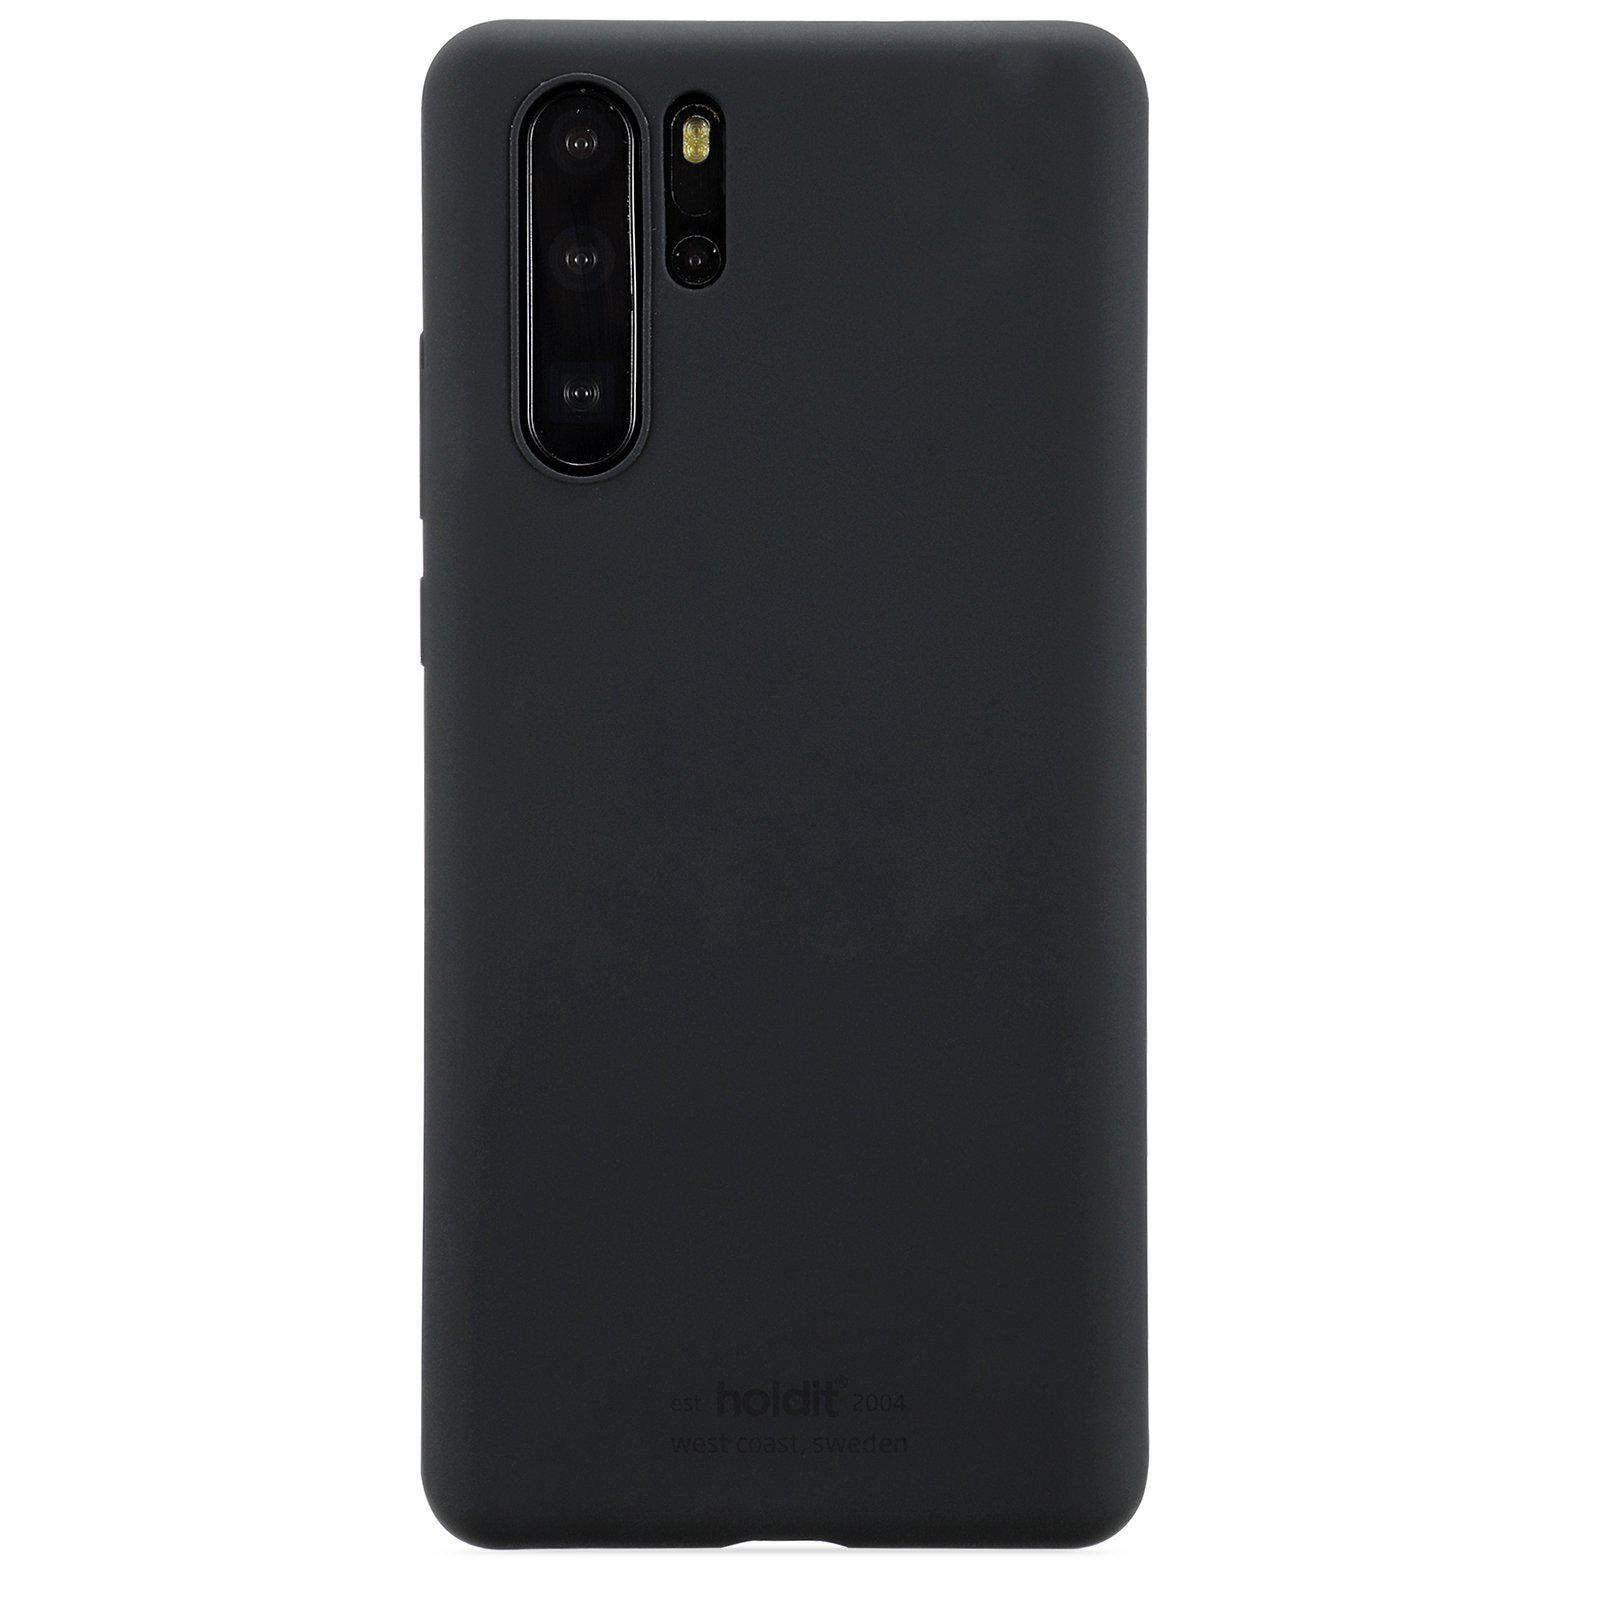 Silikonikuori Huawei P30 Pro Musta